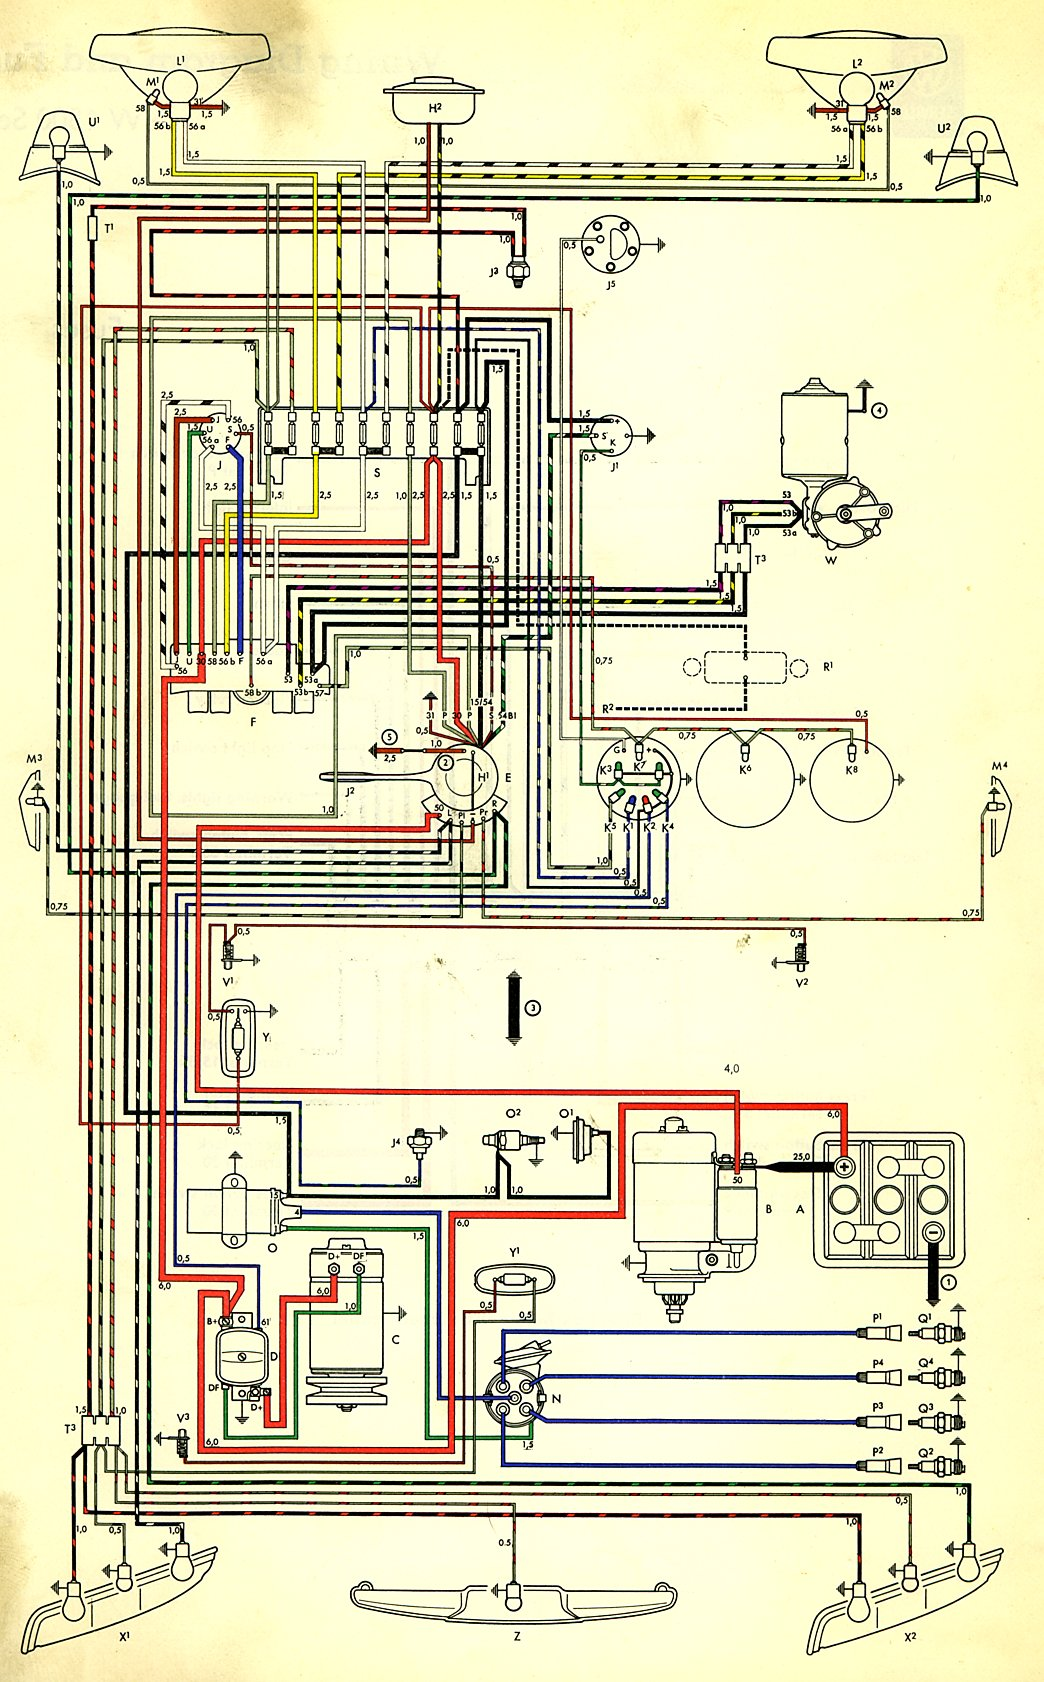 1970 vw type 2 wiring diagram tesla powerwall ac harness